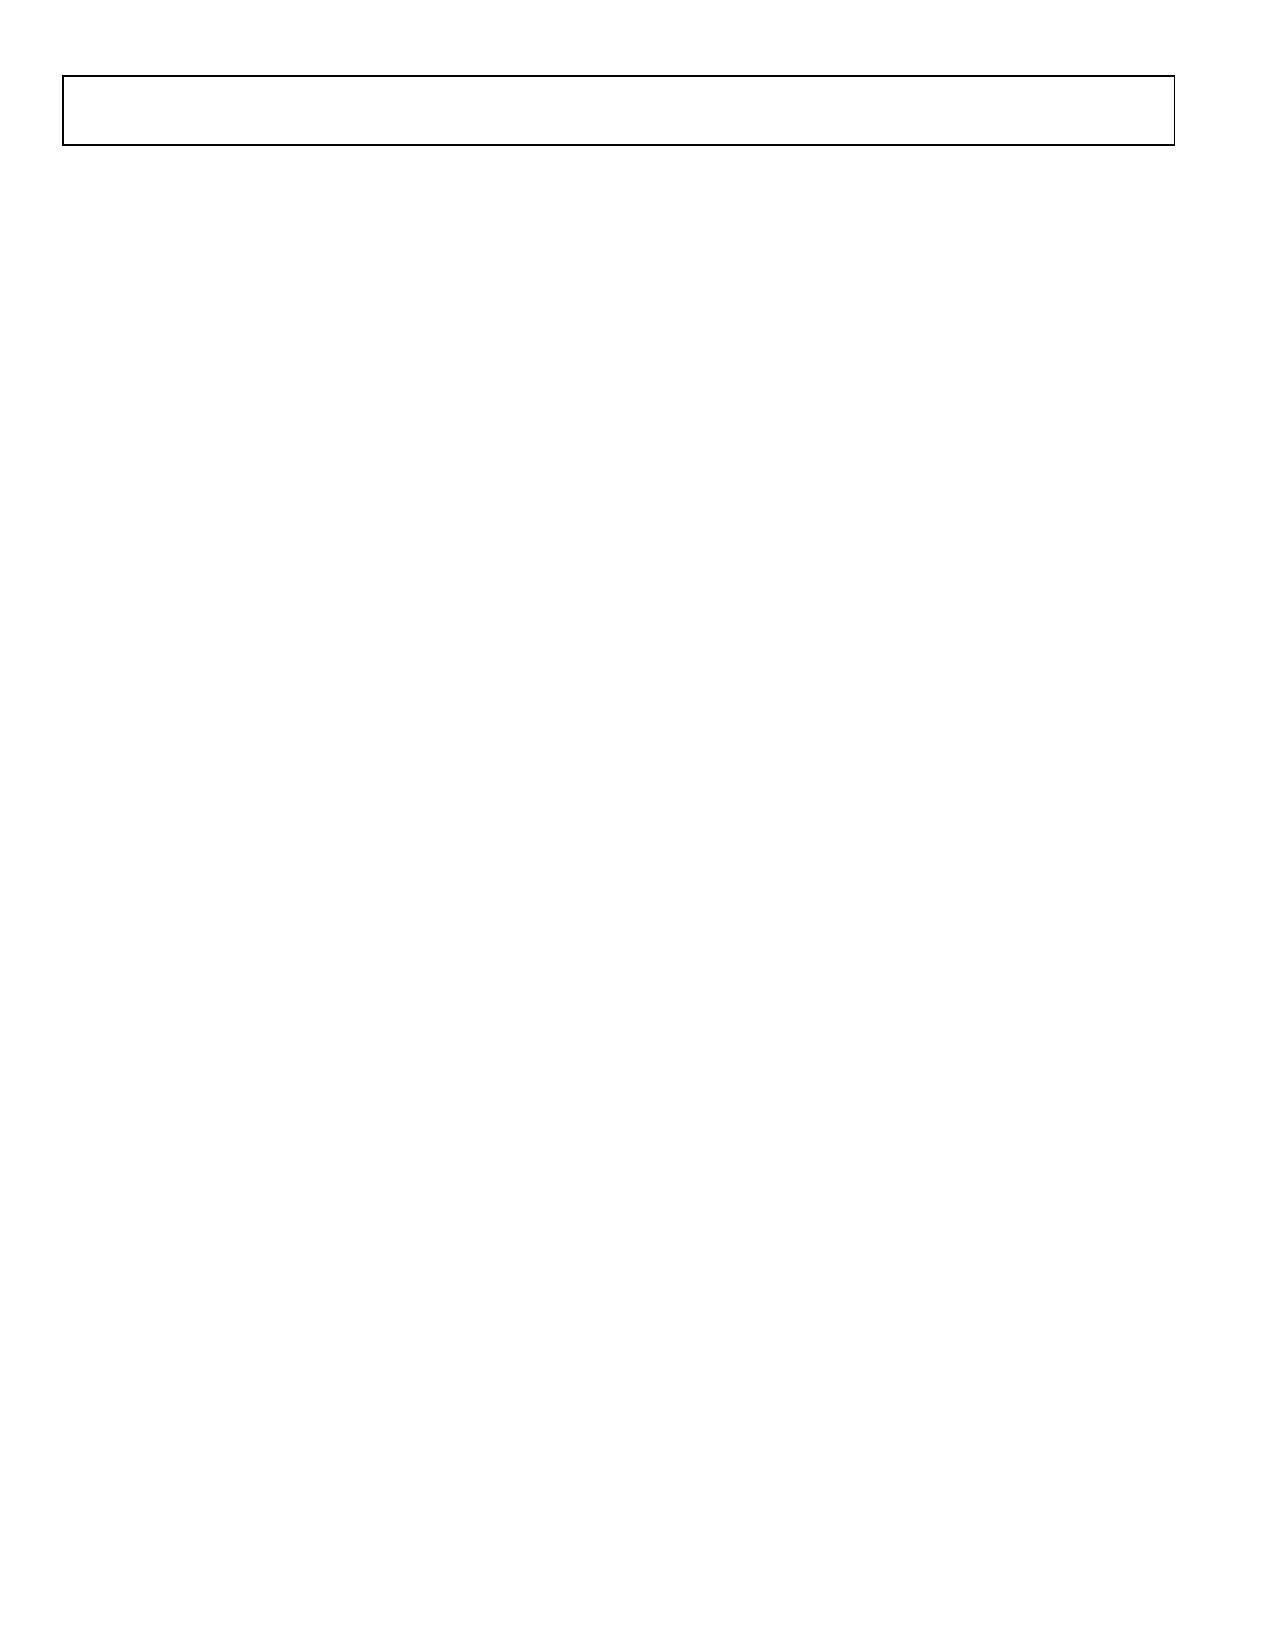 ADA4857-2 Даташит, Описание, Даташиты